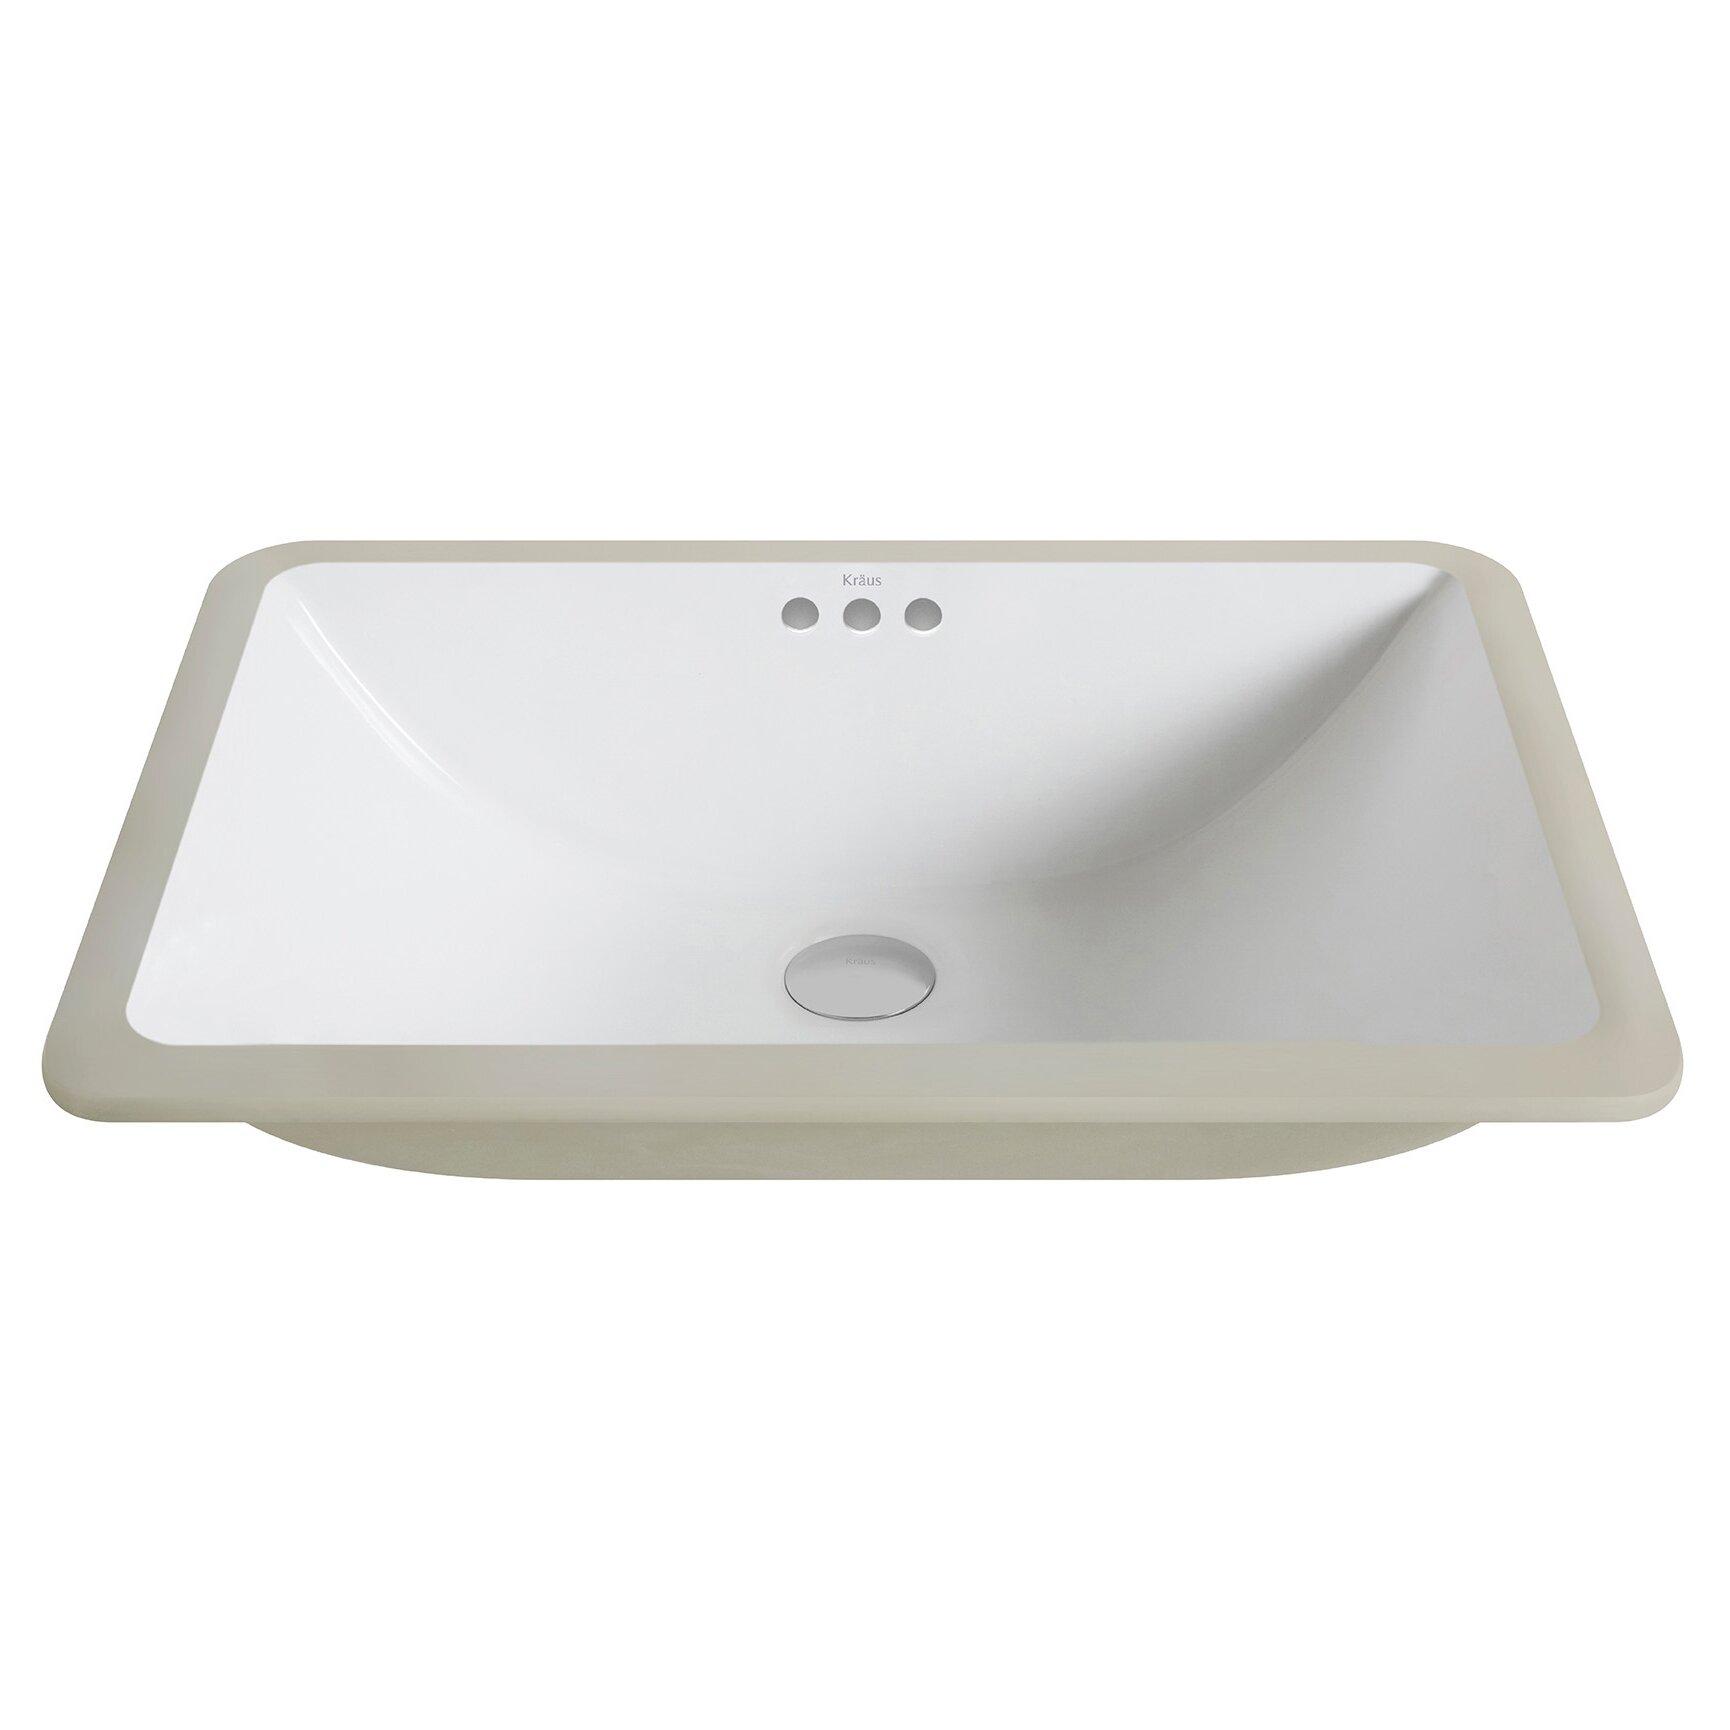 16 Bathroom Sink : Elavo 23.26